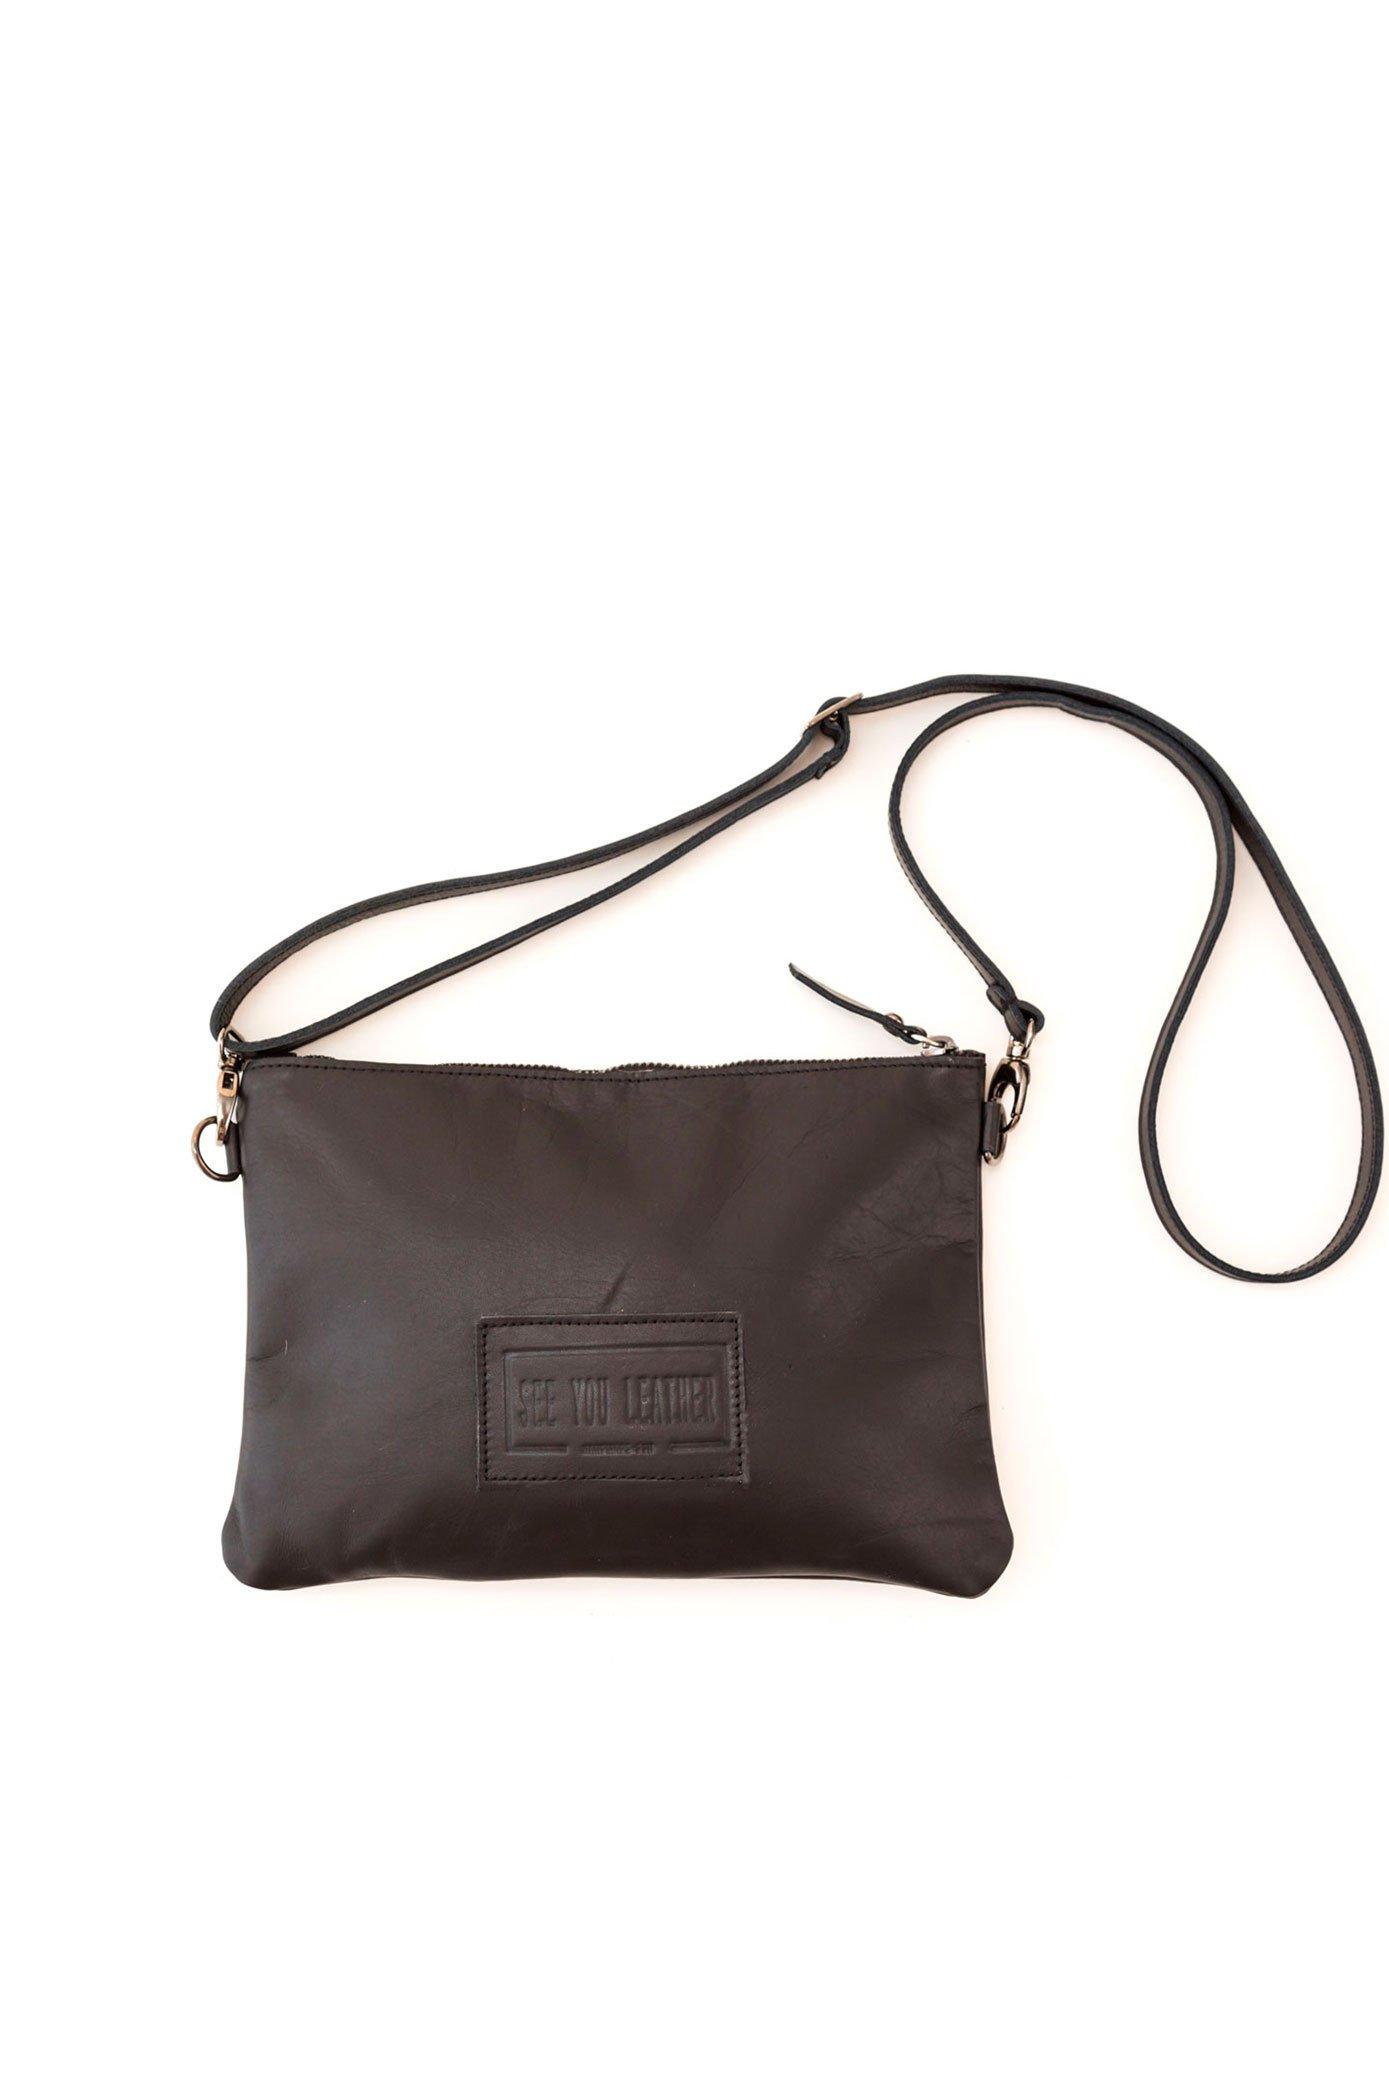 formosa-negra-bolsa-de-piel-rectangular-pequeña